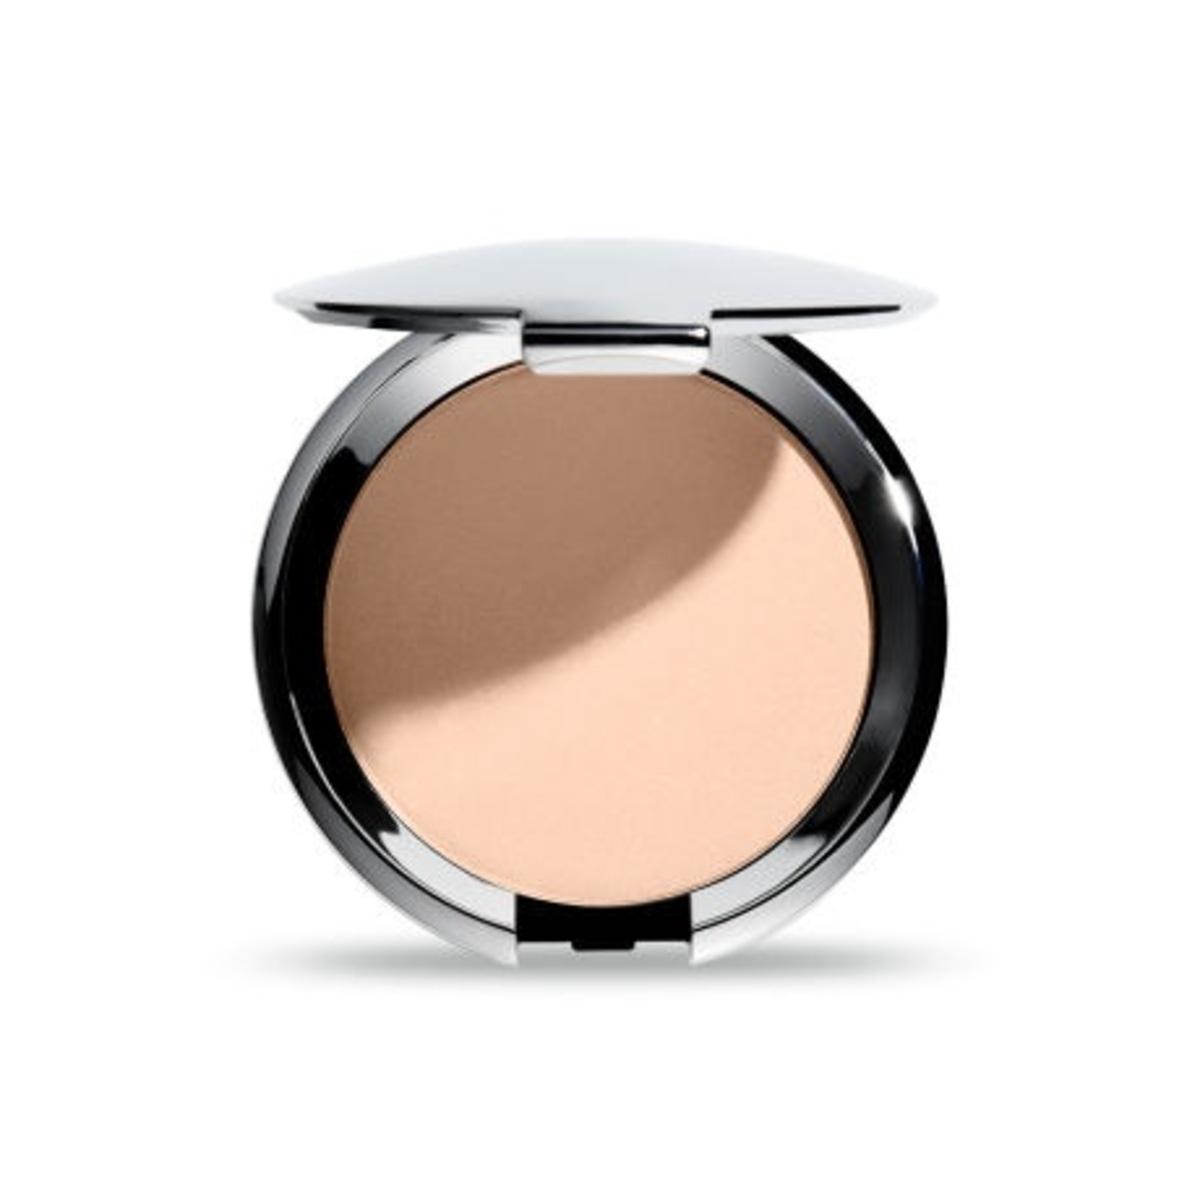 Compact Makeup # PETAL 10g  [Parallel Import Product]